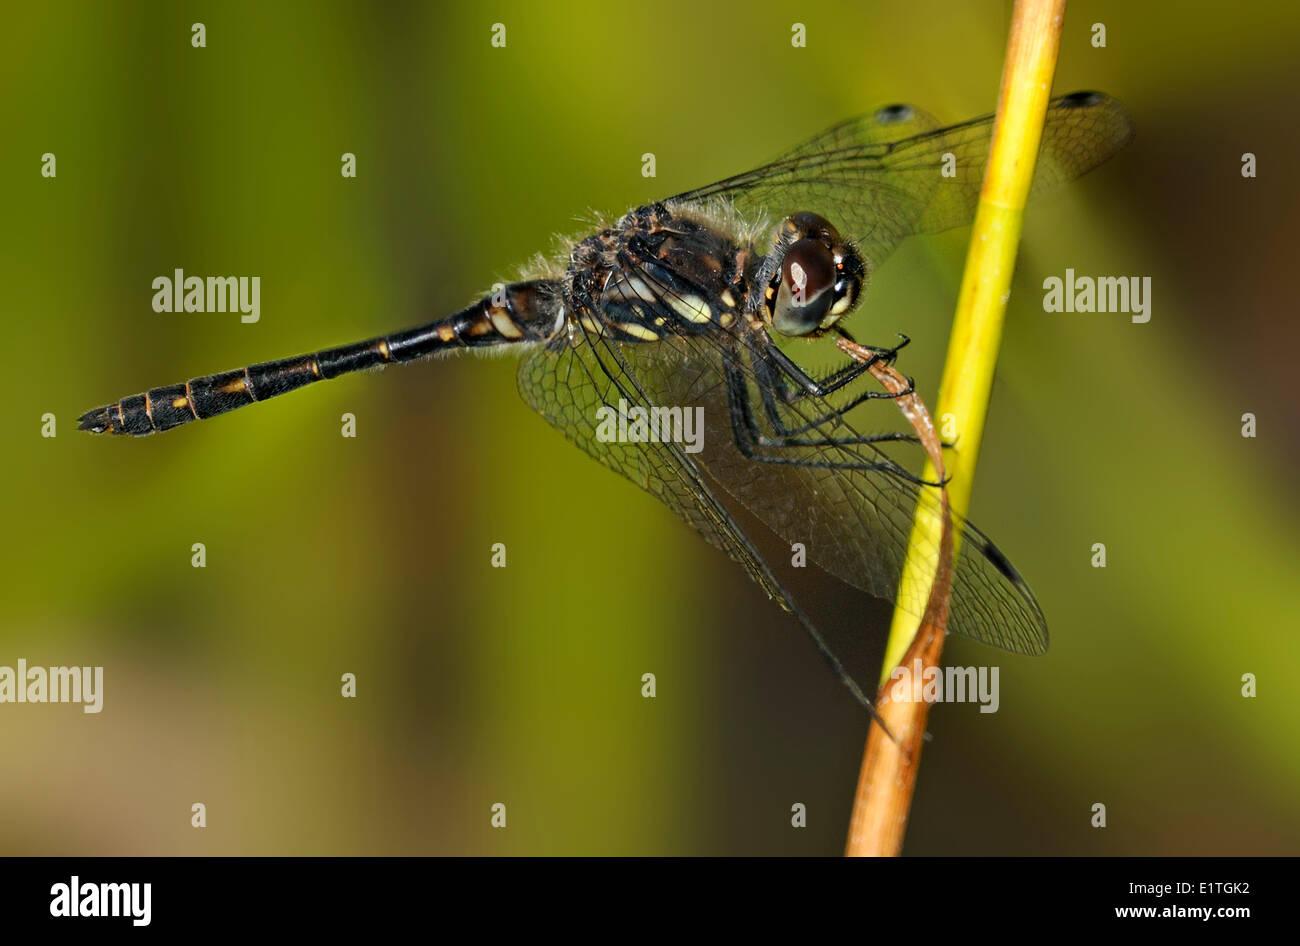 Black Meadowhawk (Sympetrum danae) at Bowser Bog, Bowser BC Stock Photo